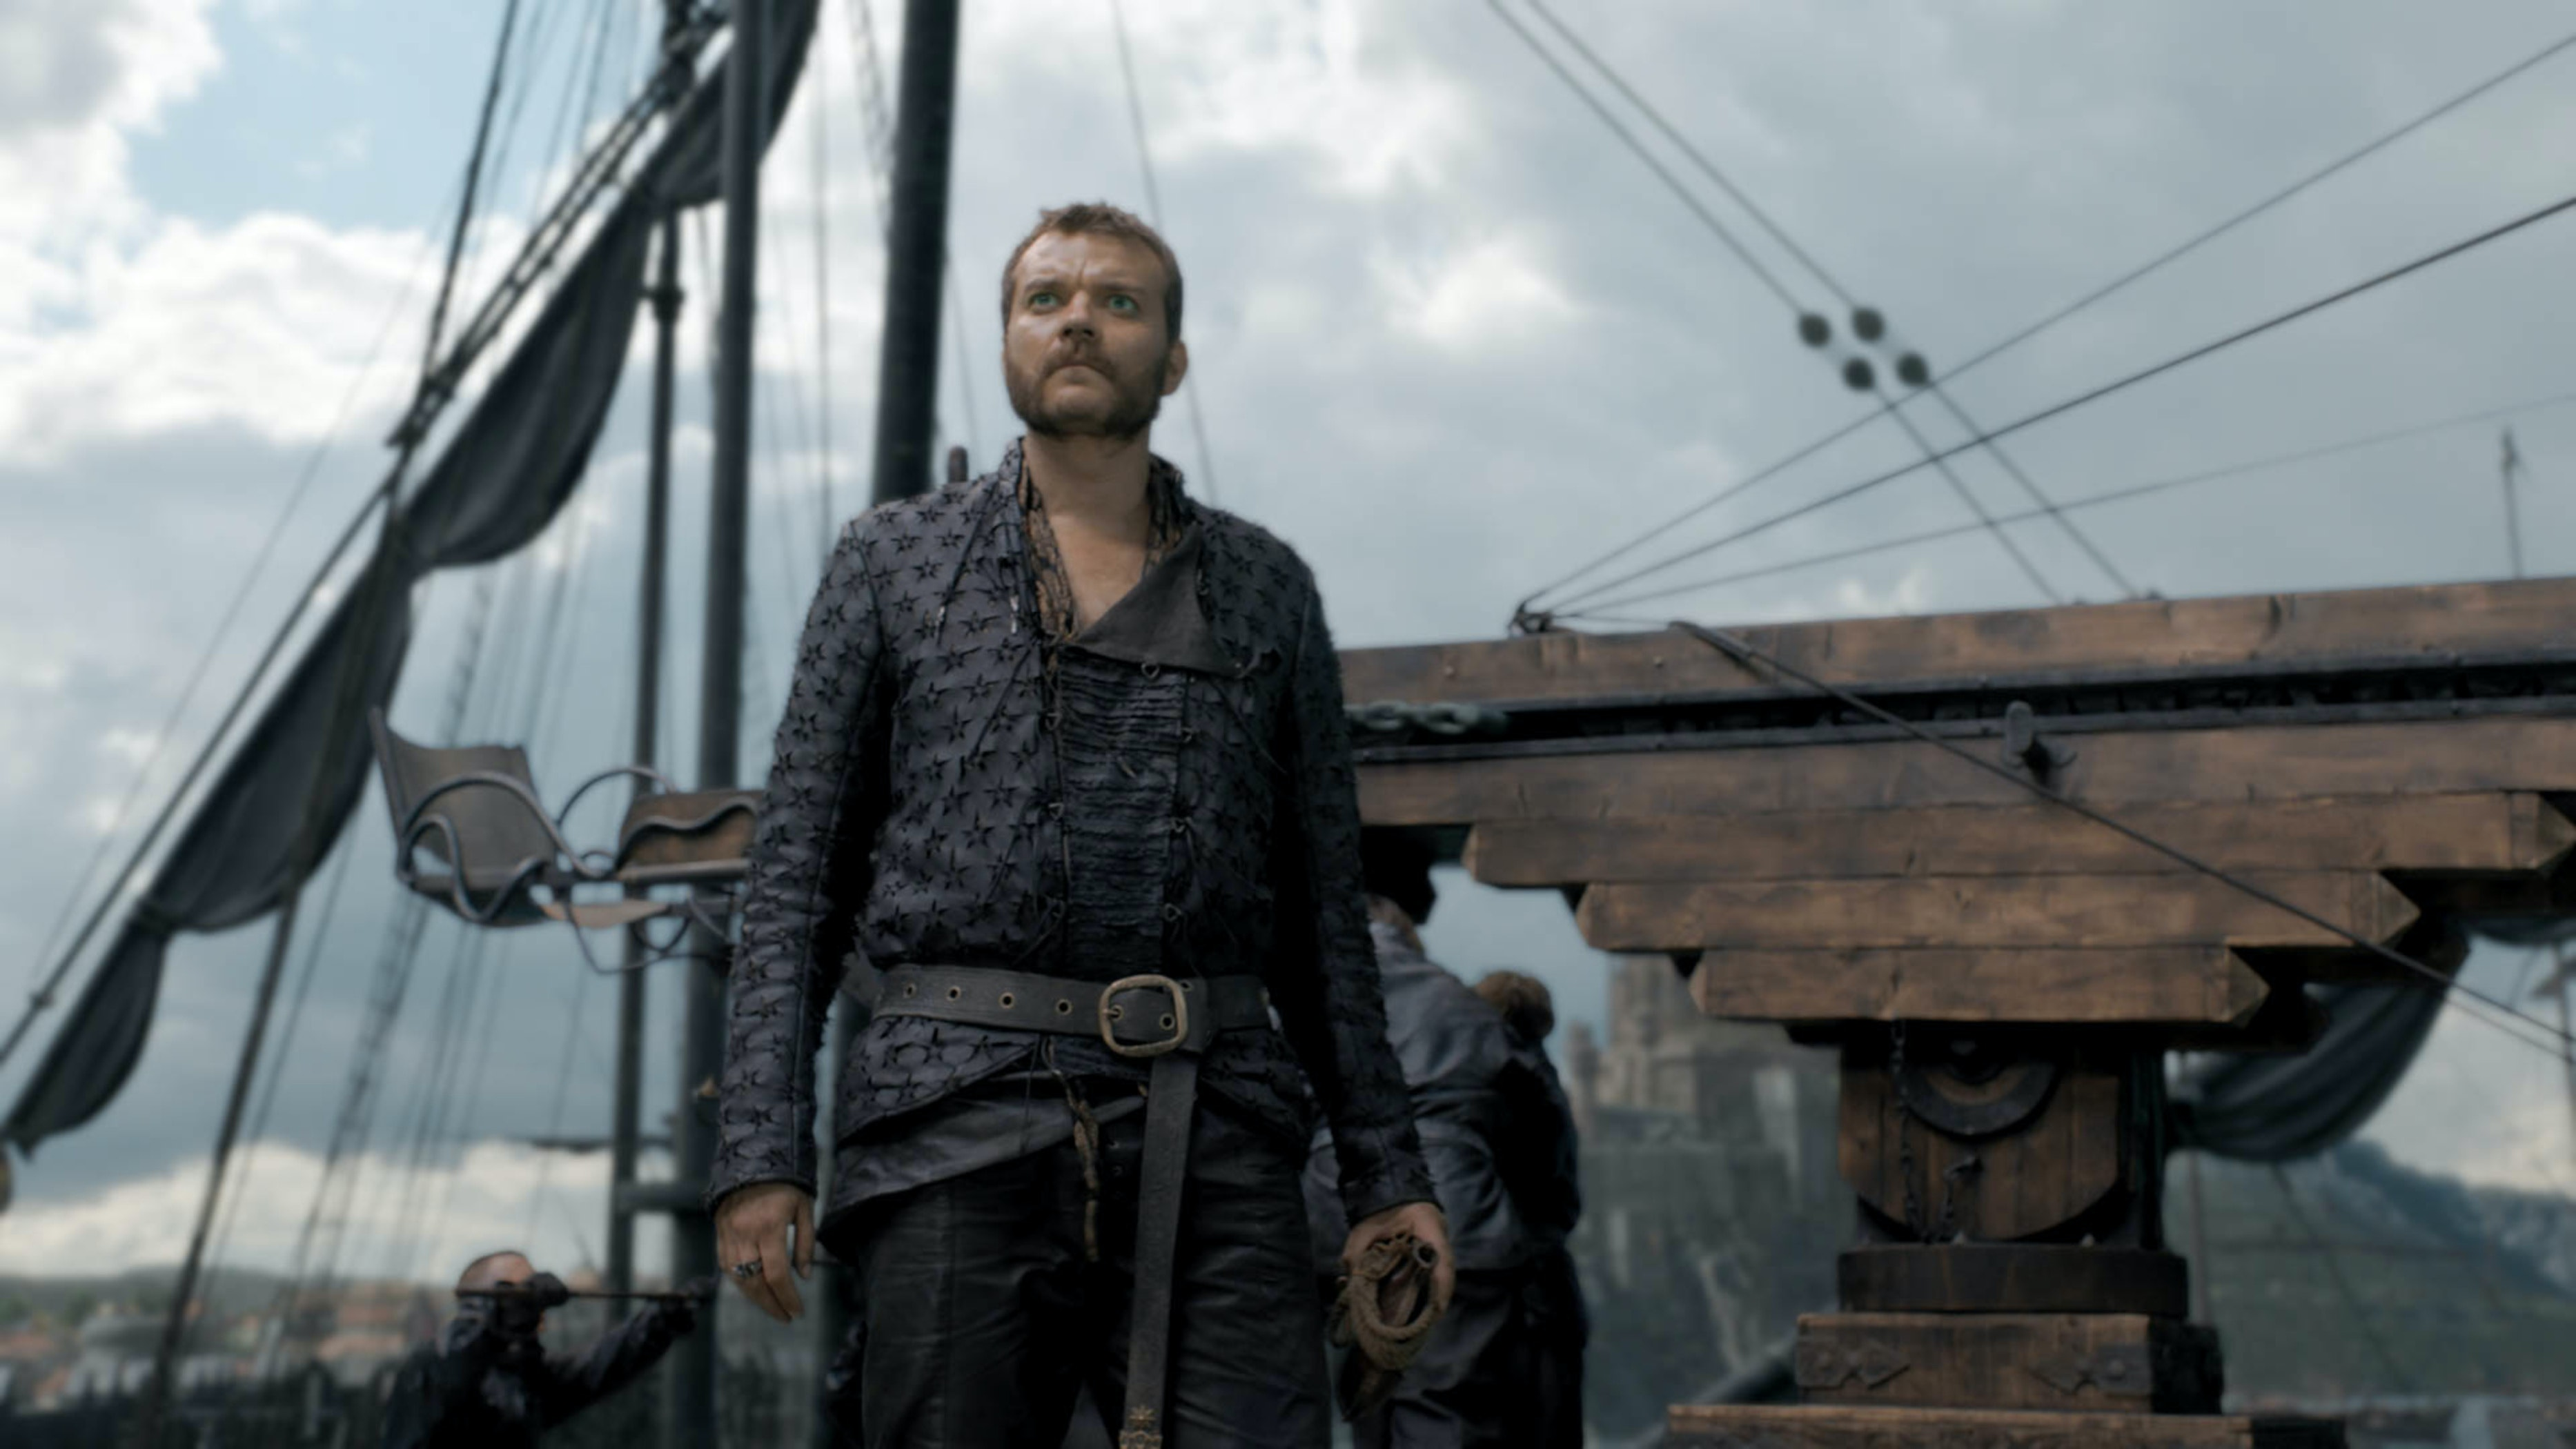 Game of thrones season 8 episode 5 opening scene